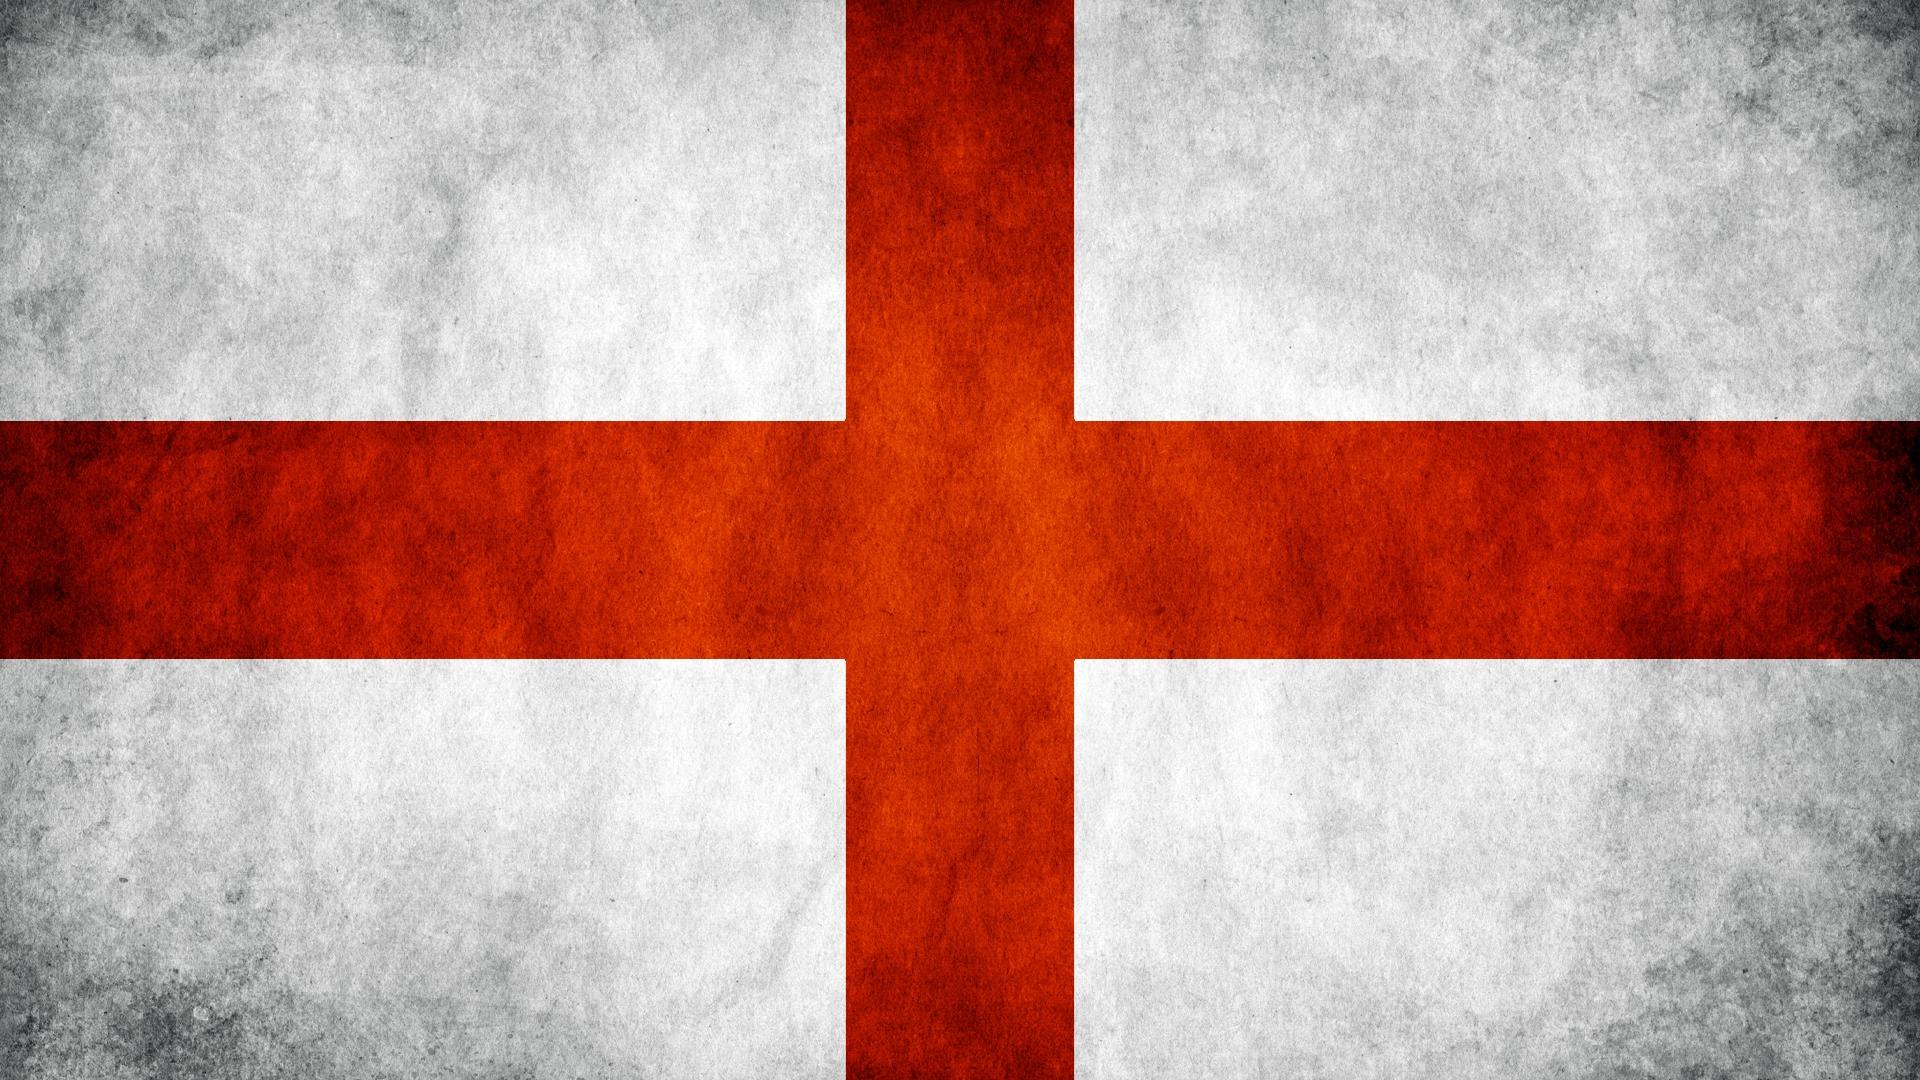 Union Jack Iphone Wallpaper England Flag Wallpaper Hd Wallpapers